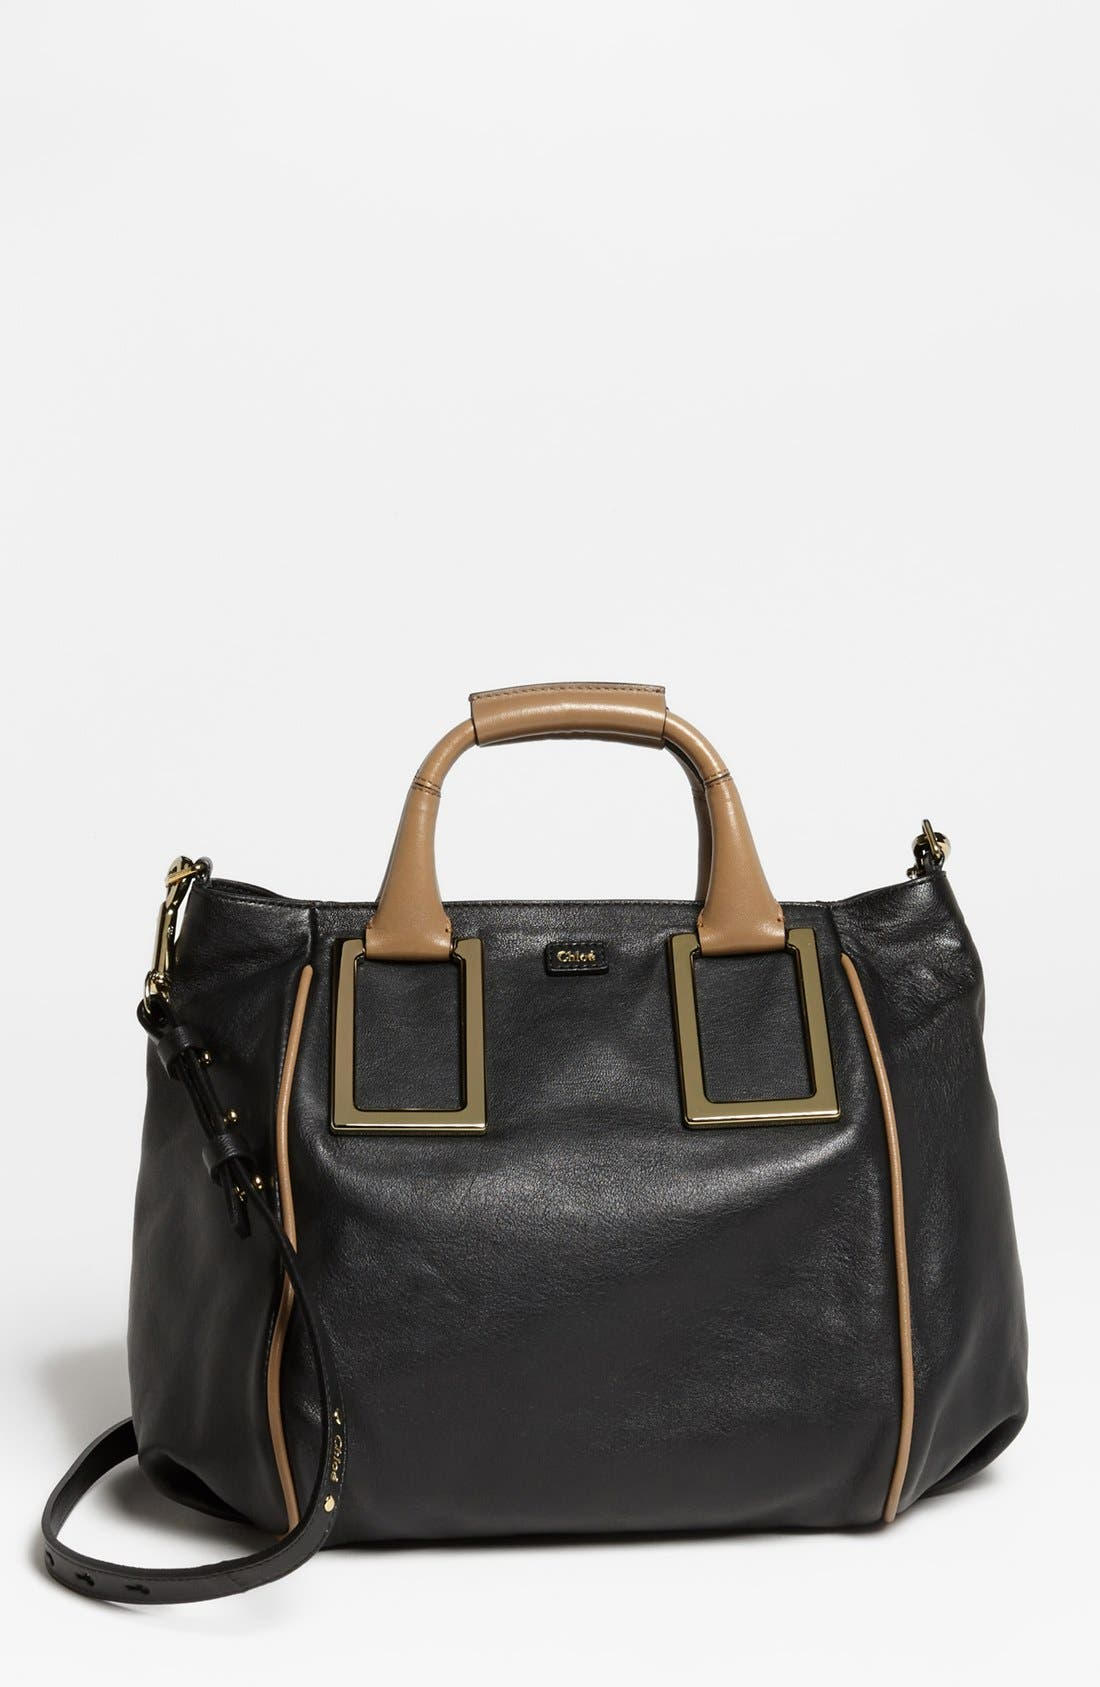 Main Image - Chloé 'Ethel - Medium' Leather Tote